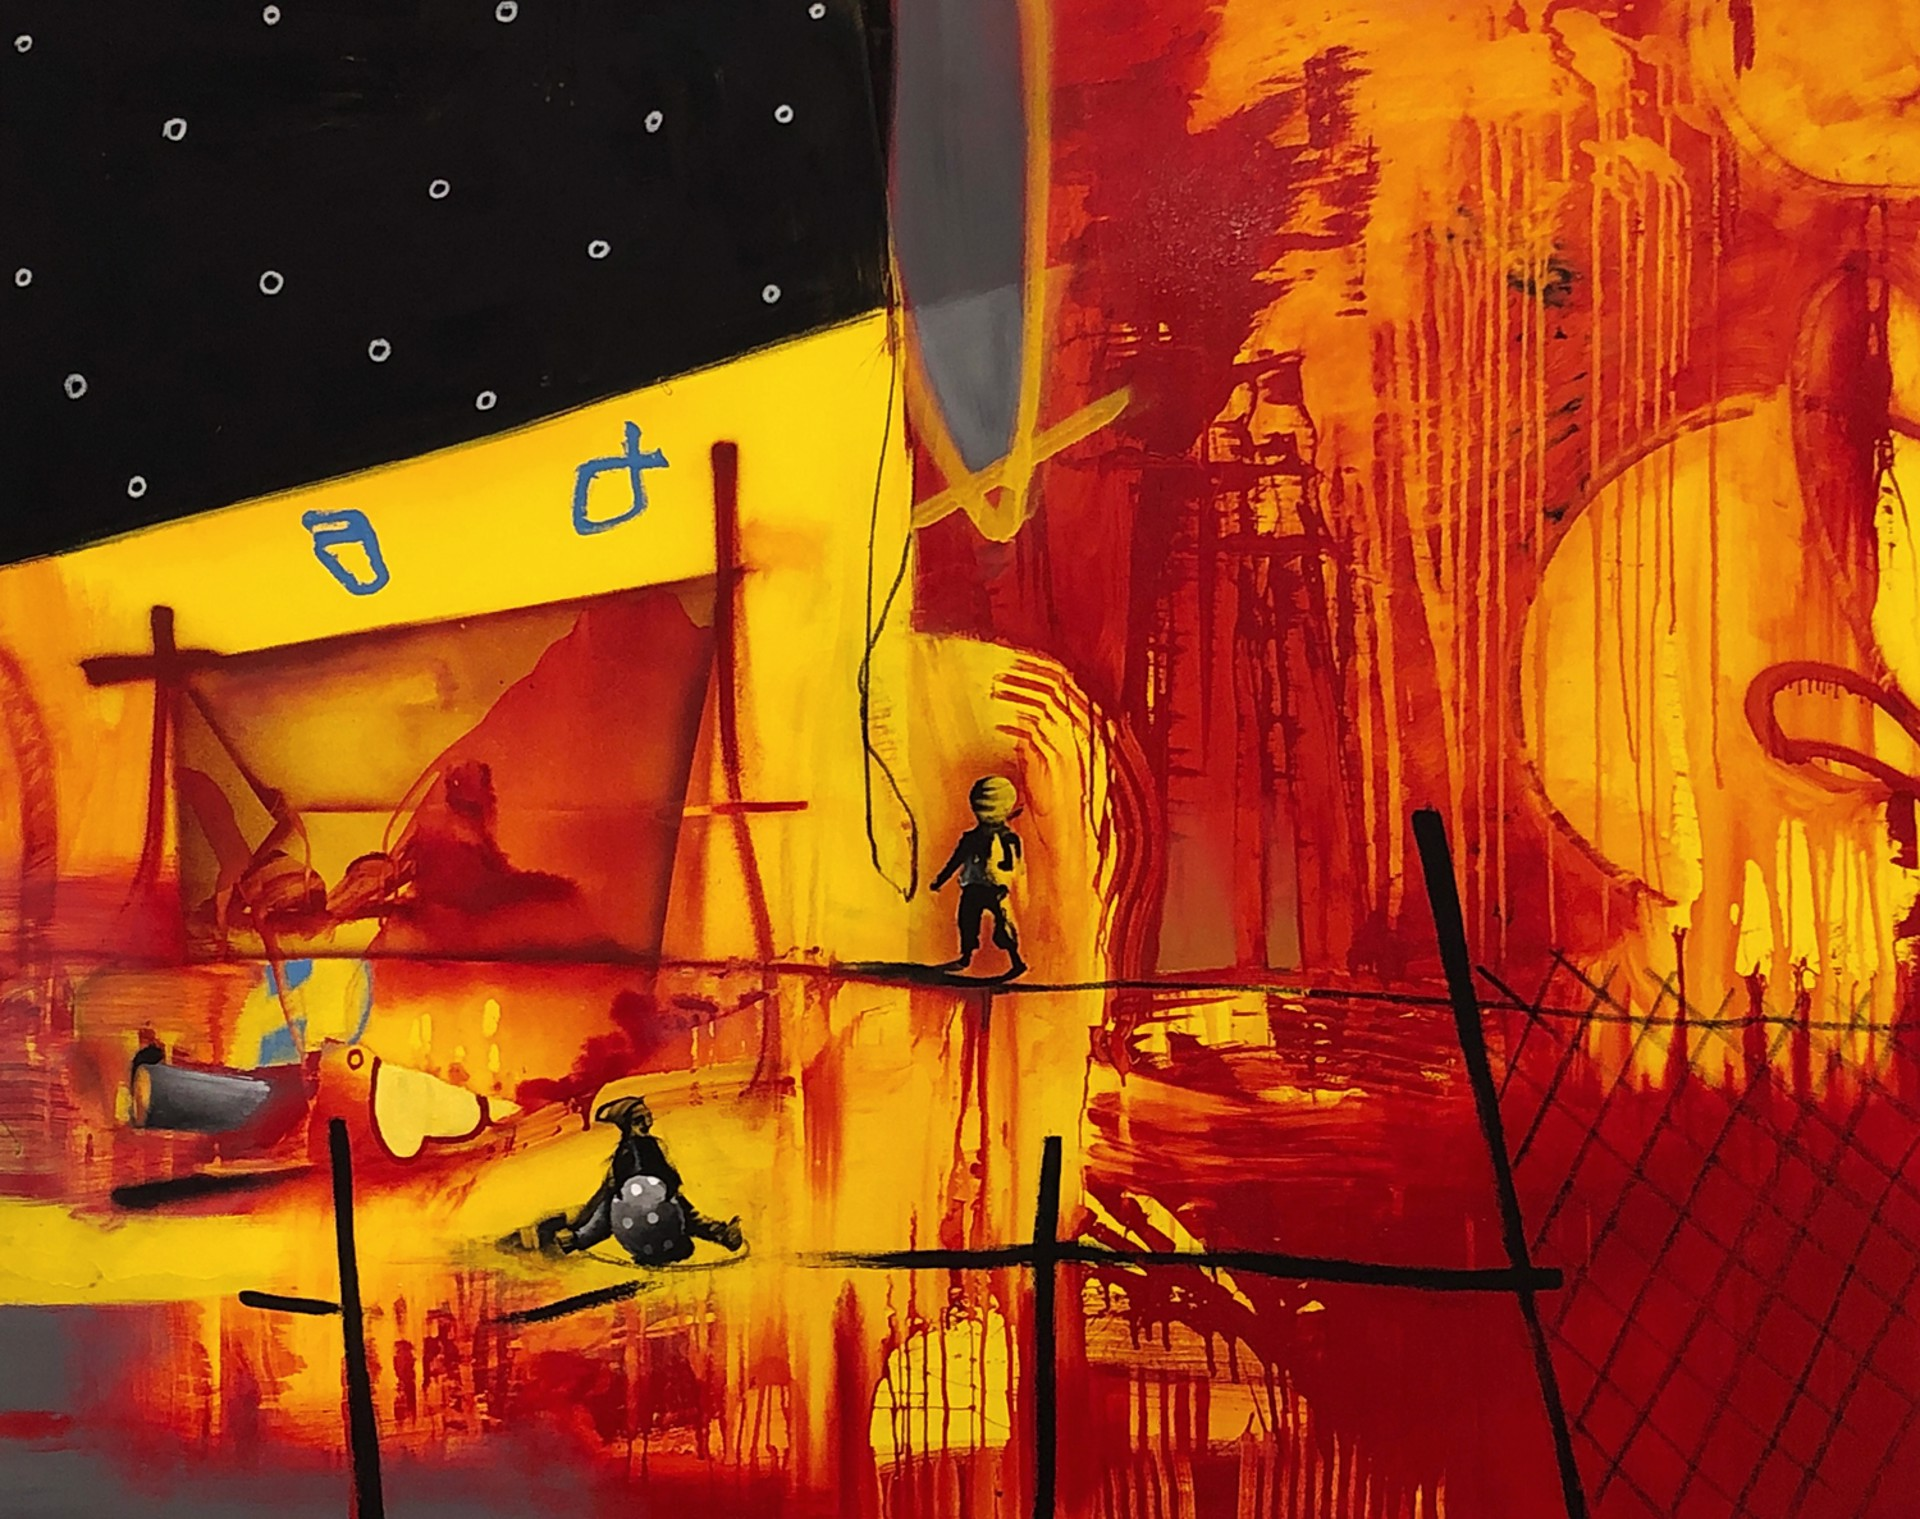 Tent City #6 by Marcus Jansen (b. 1968)